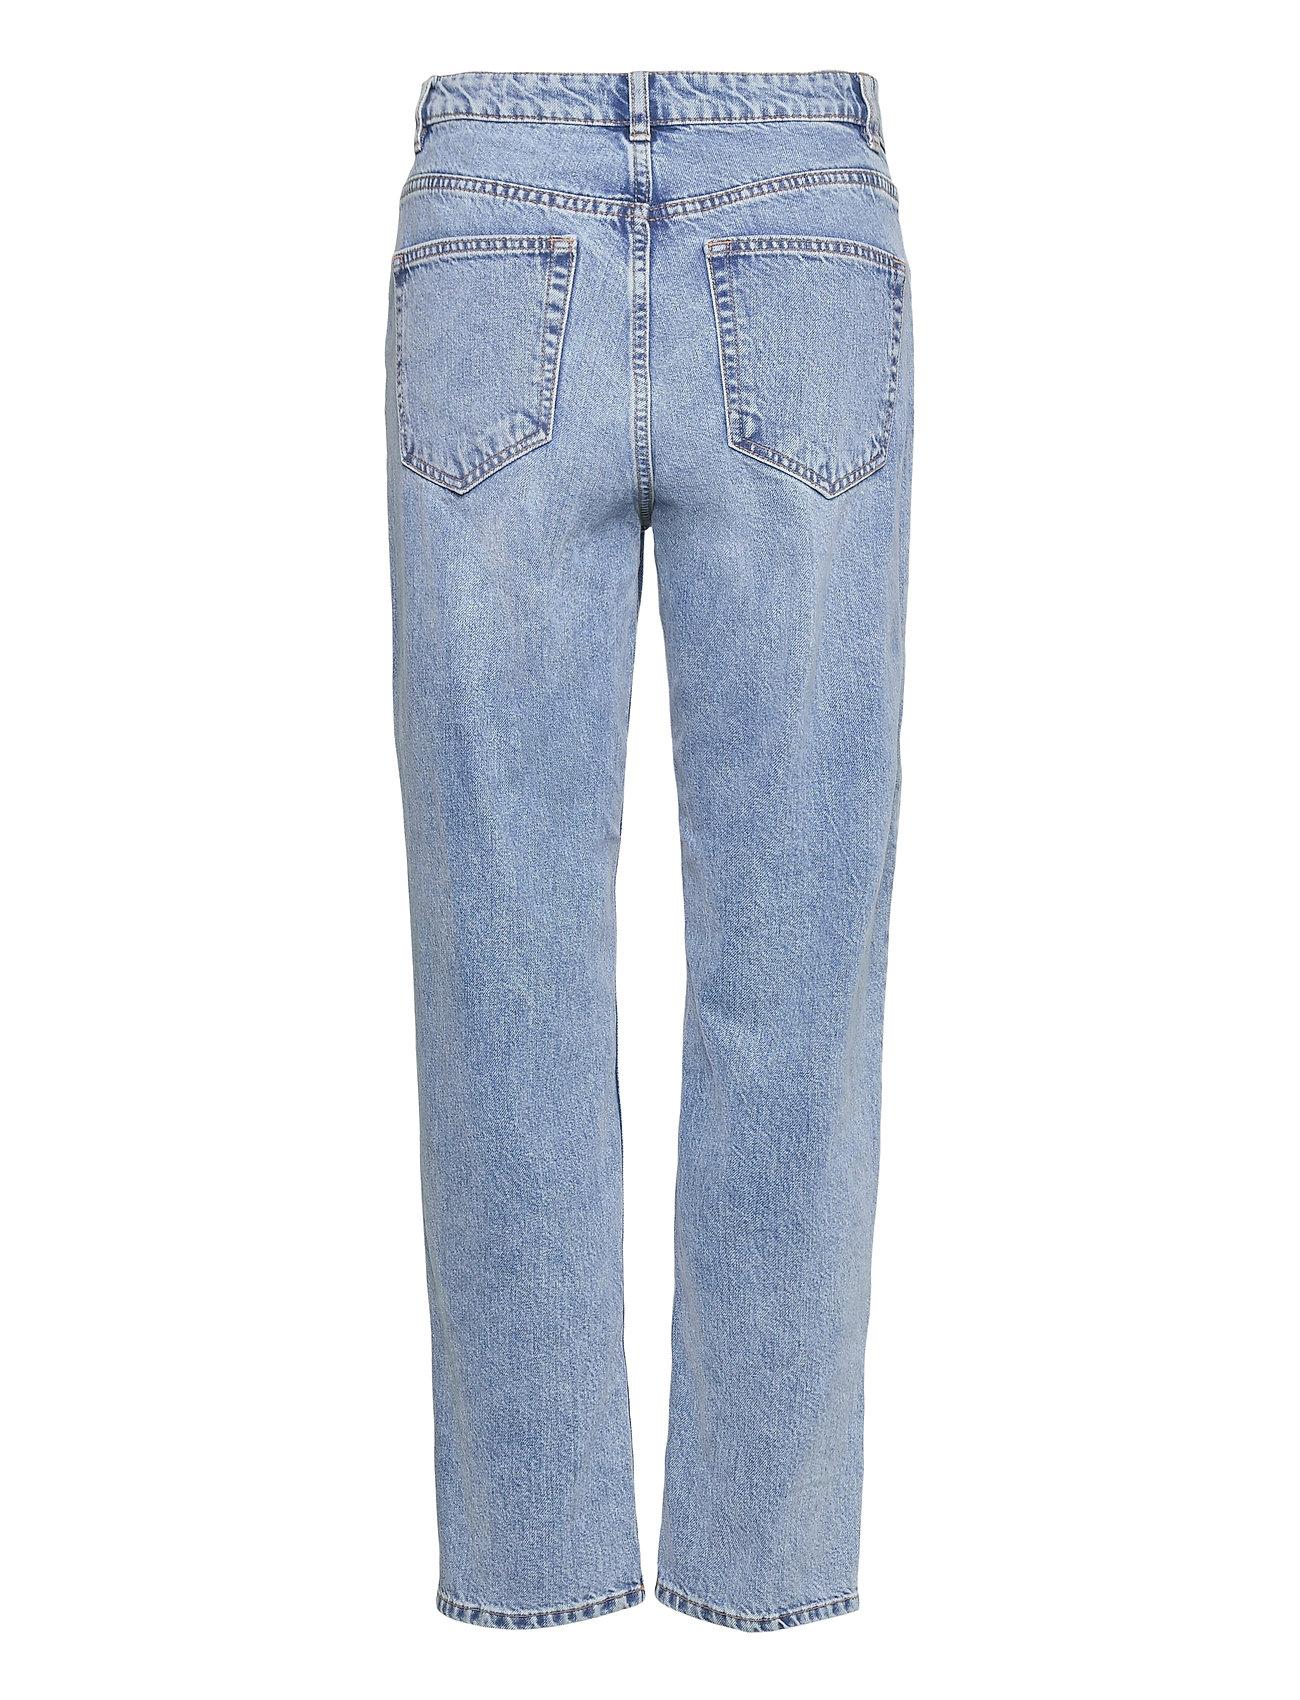 Lindex - Trousers denim Betty fresh blu - mom jeans - blue - 1